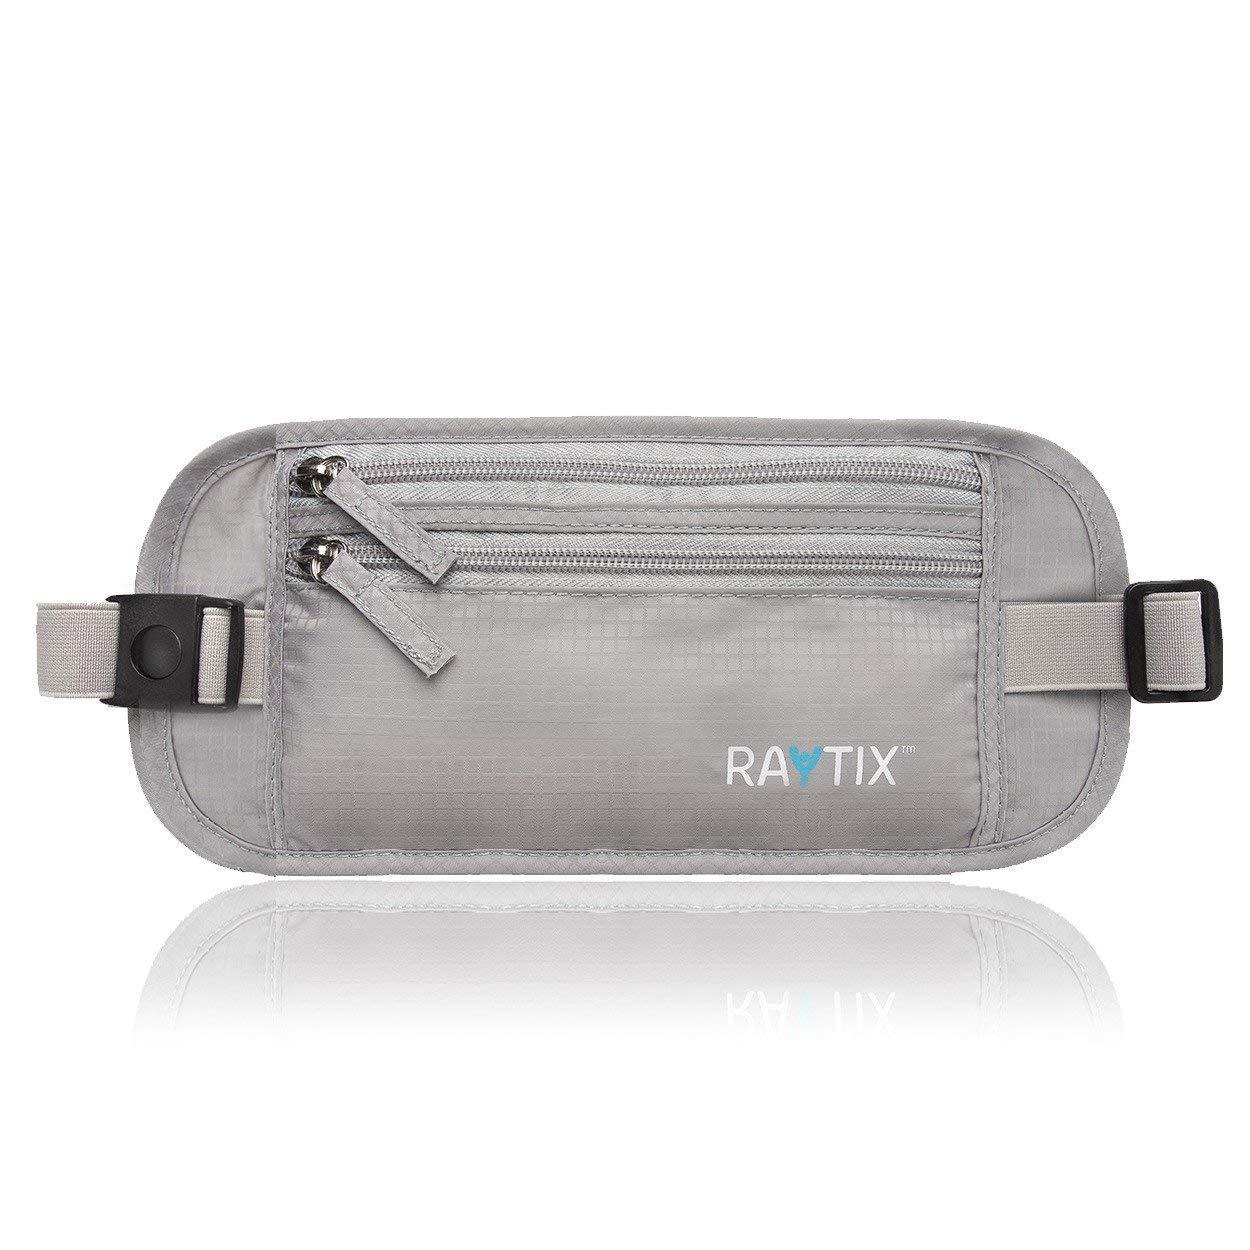 Raytix Travel Money Belt With RFID Transmissions -Secure, Hidden Travel Wallet (Gray) by Raytix